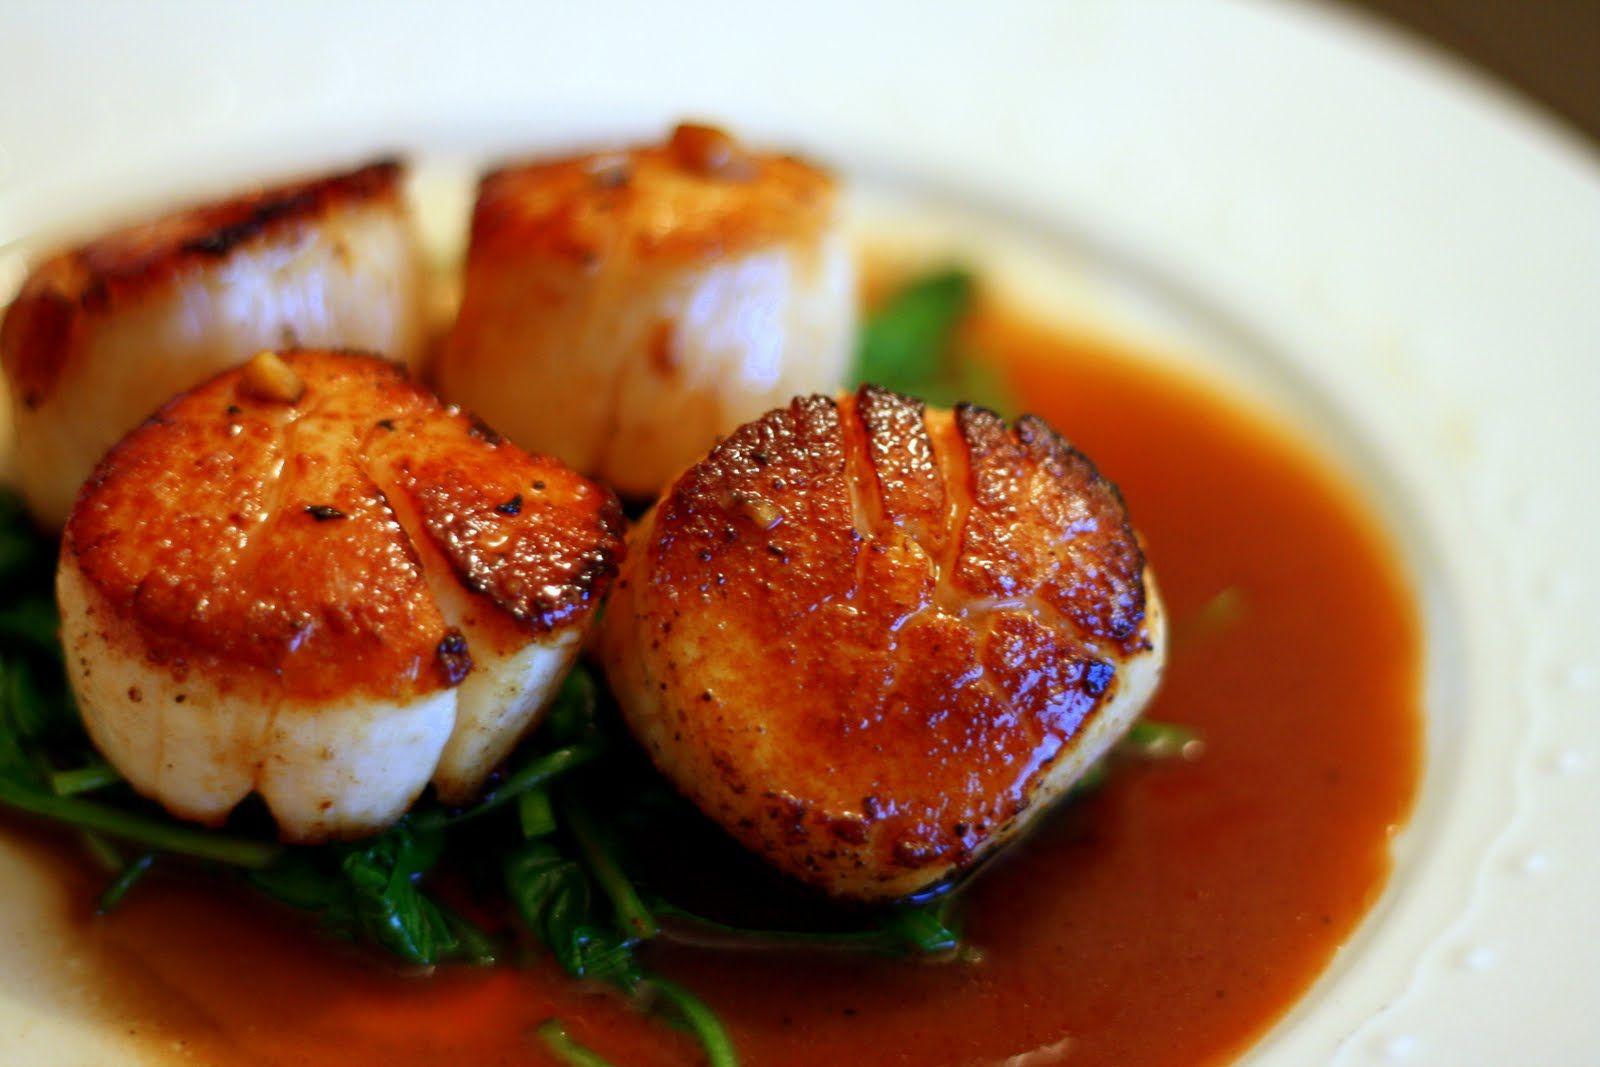 Img 0799 Jpg Jpeg Image 1600x1067 Pixels Scaled 53 Scallop Recipes Seafood Recipes Food